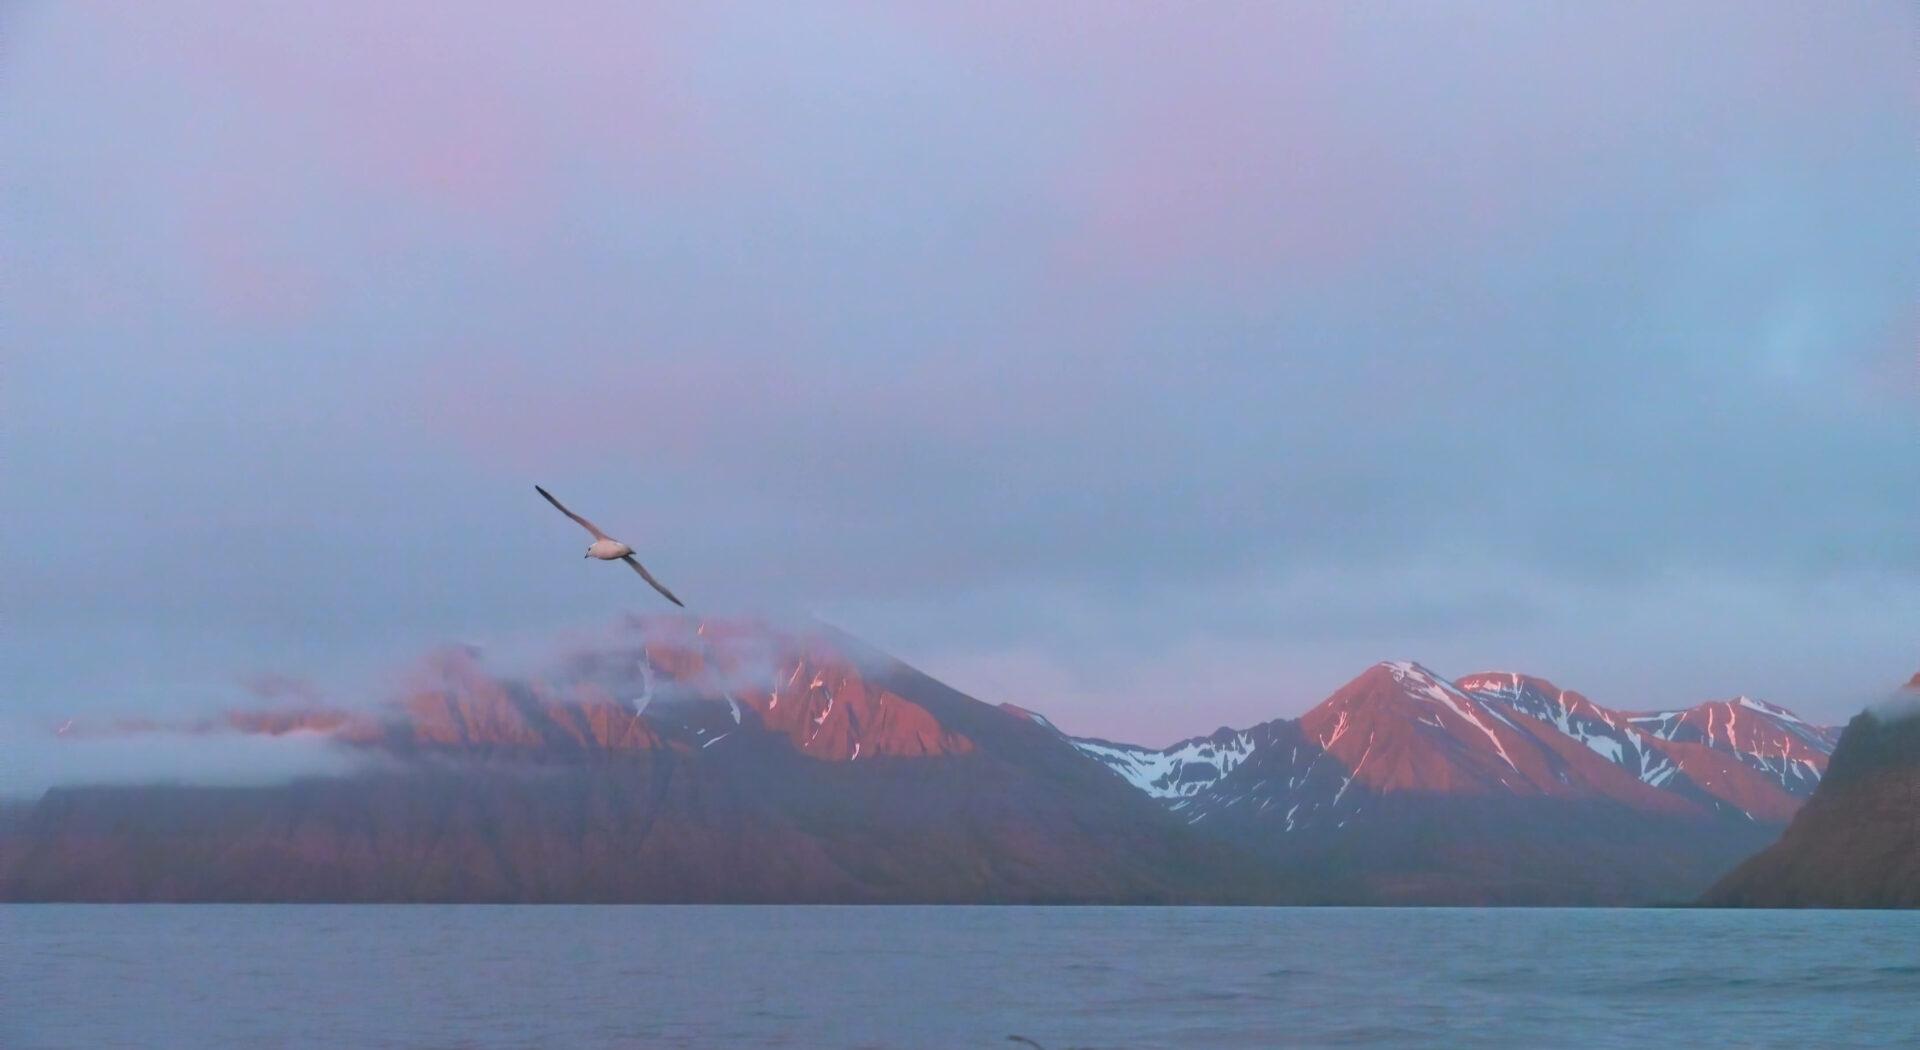 17. P1060661 dawn + bird